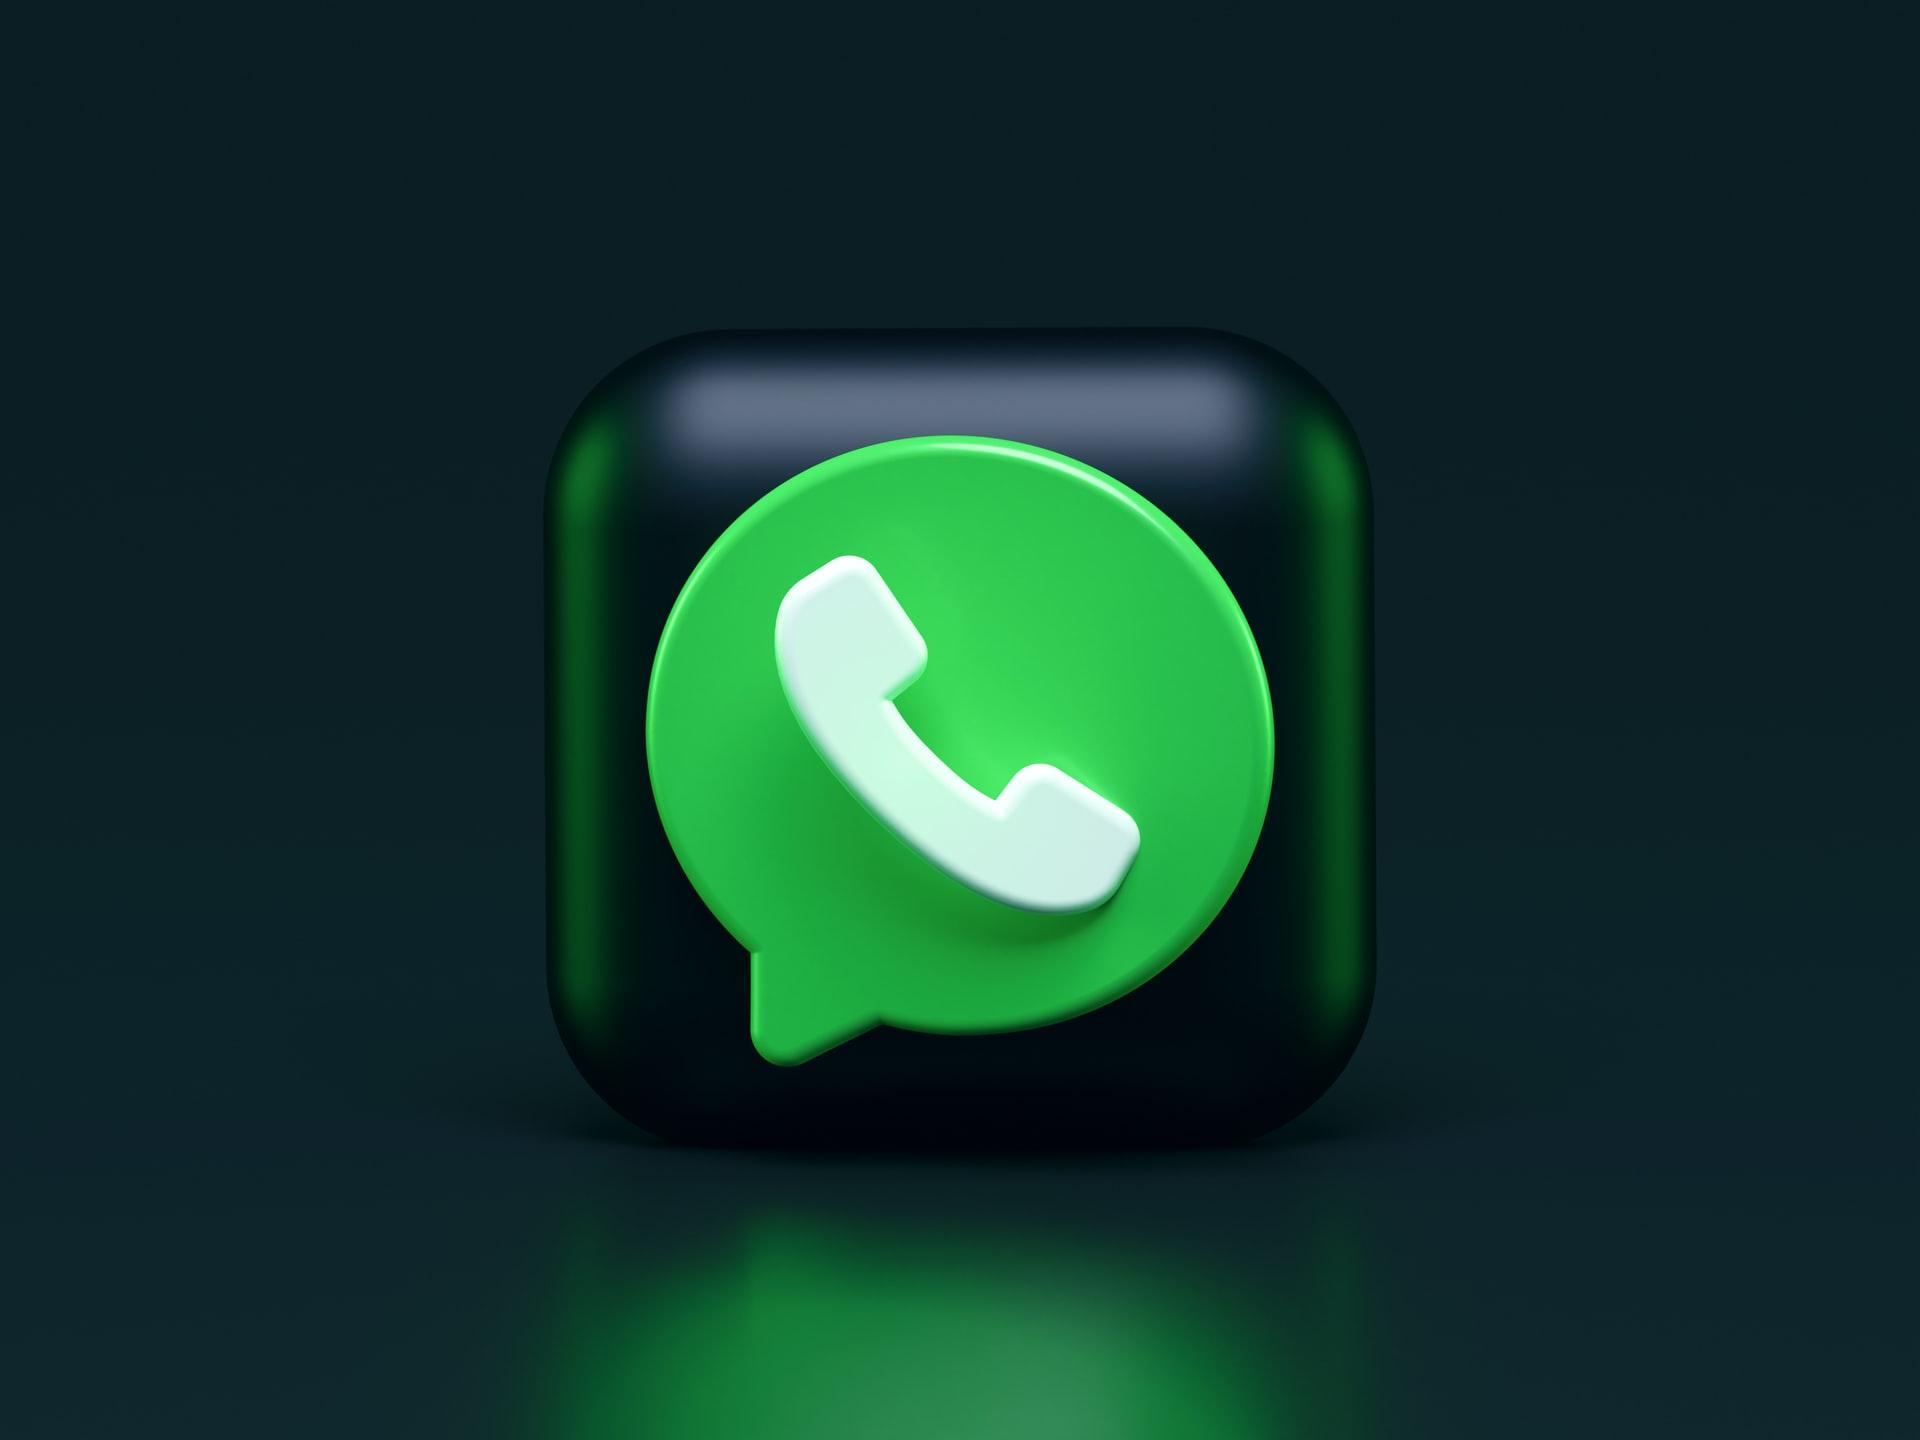 whatsapp-envoyer-image-video-ephemere